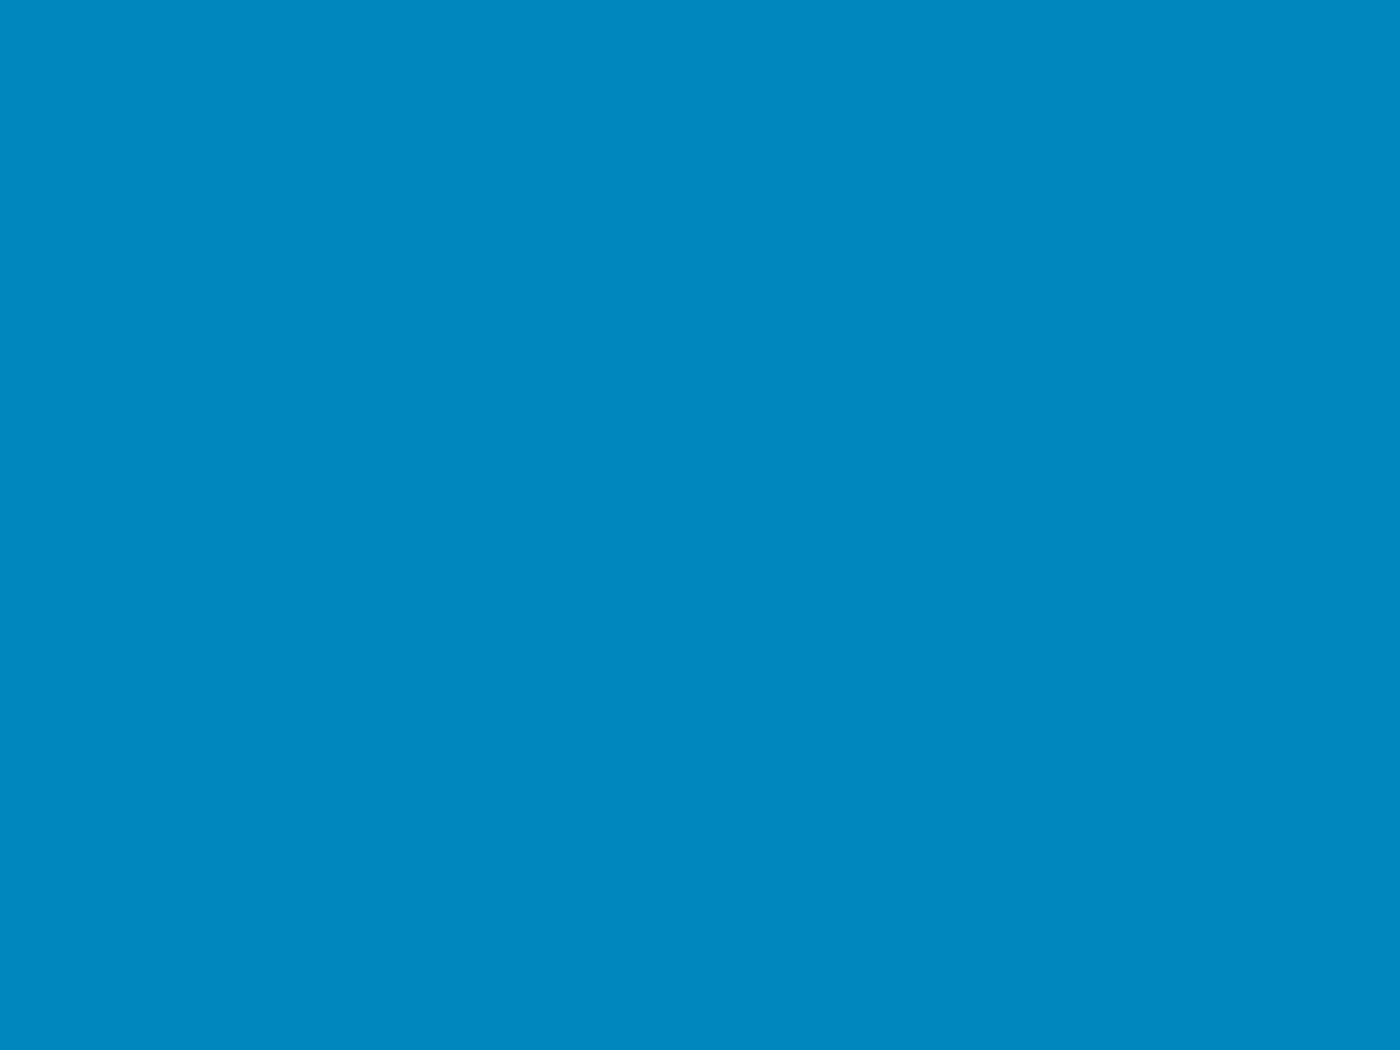 1400x1050 Blue NCS Solid Color Background